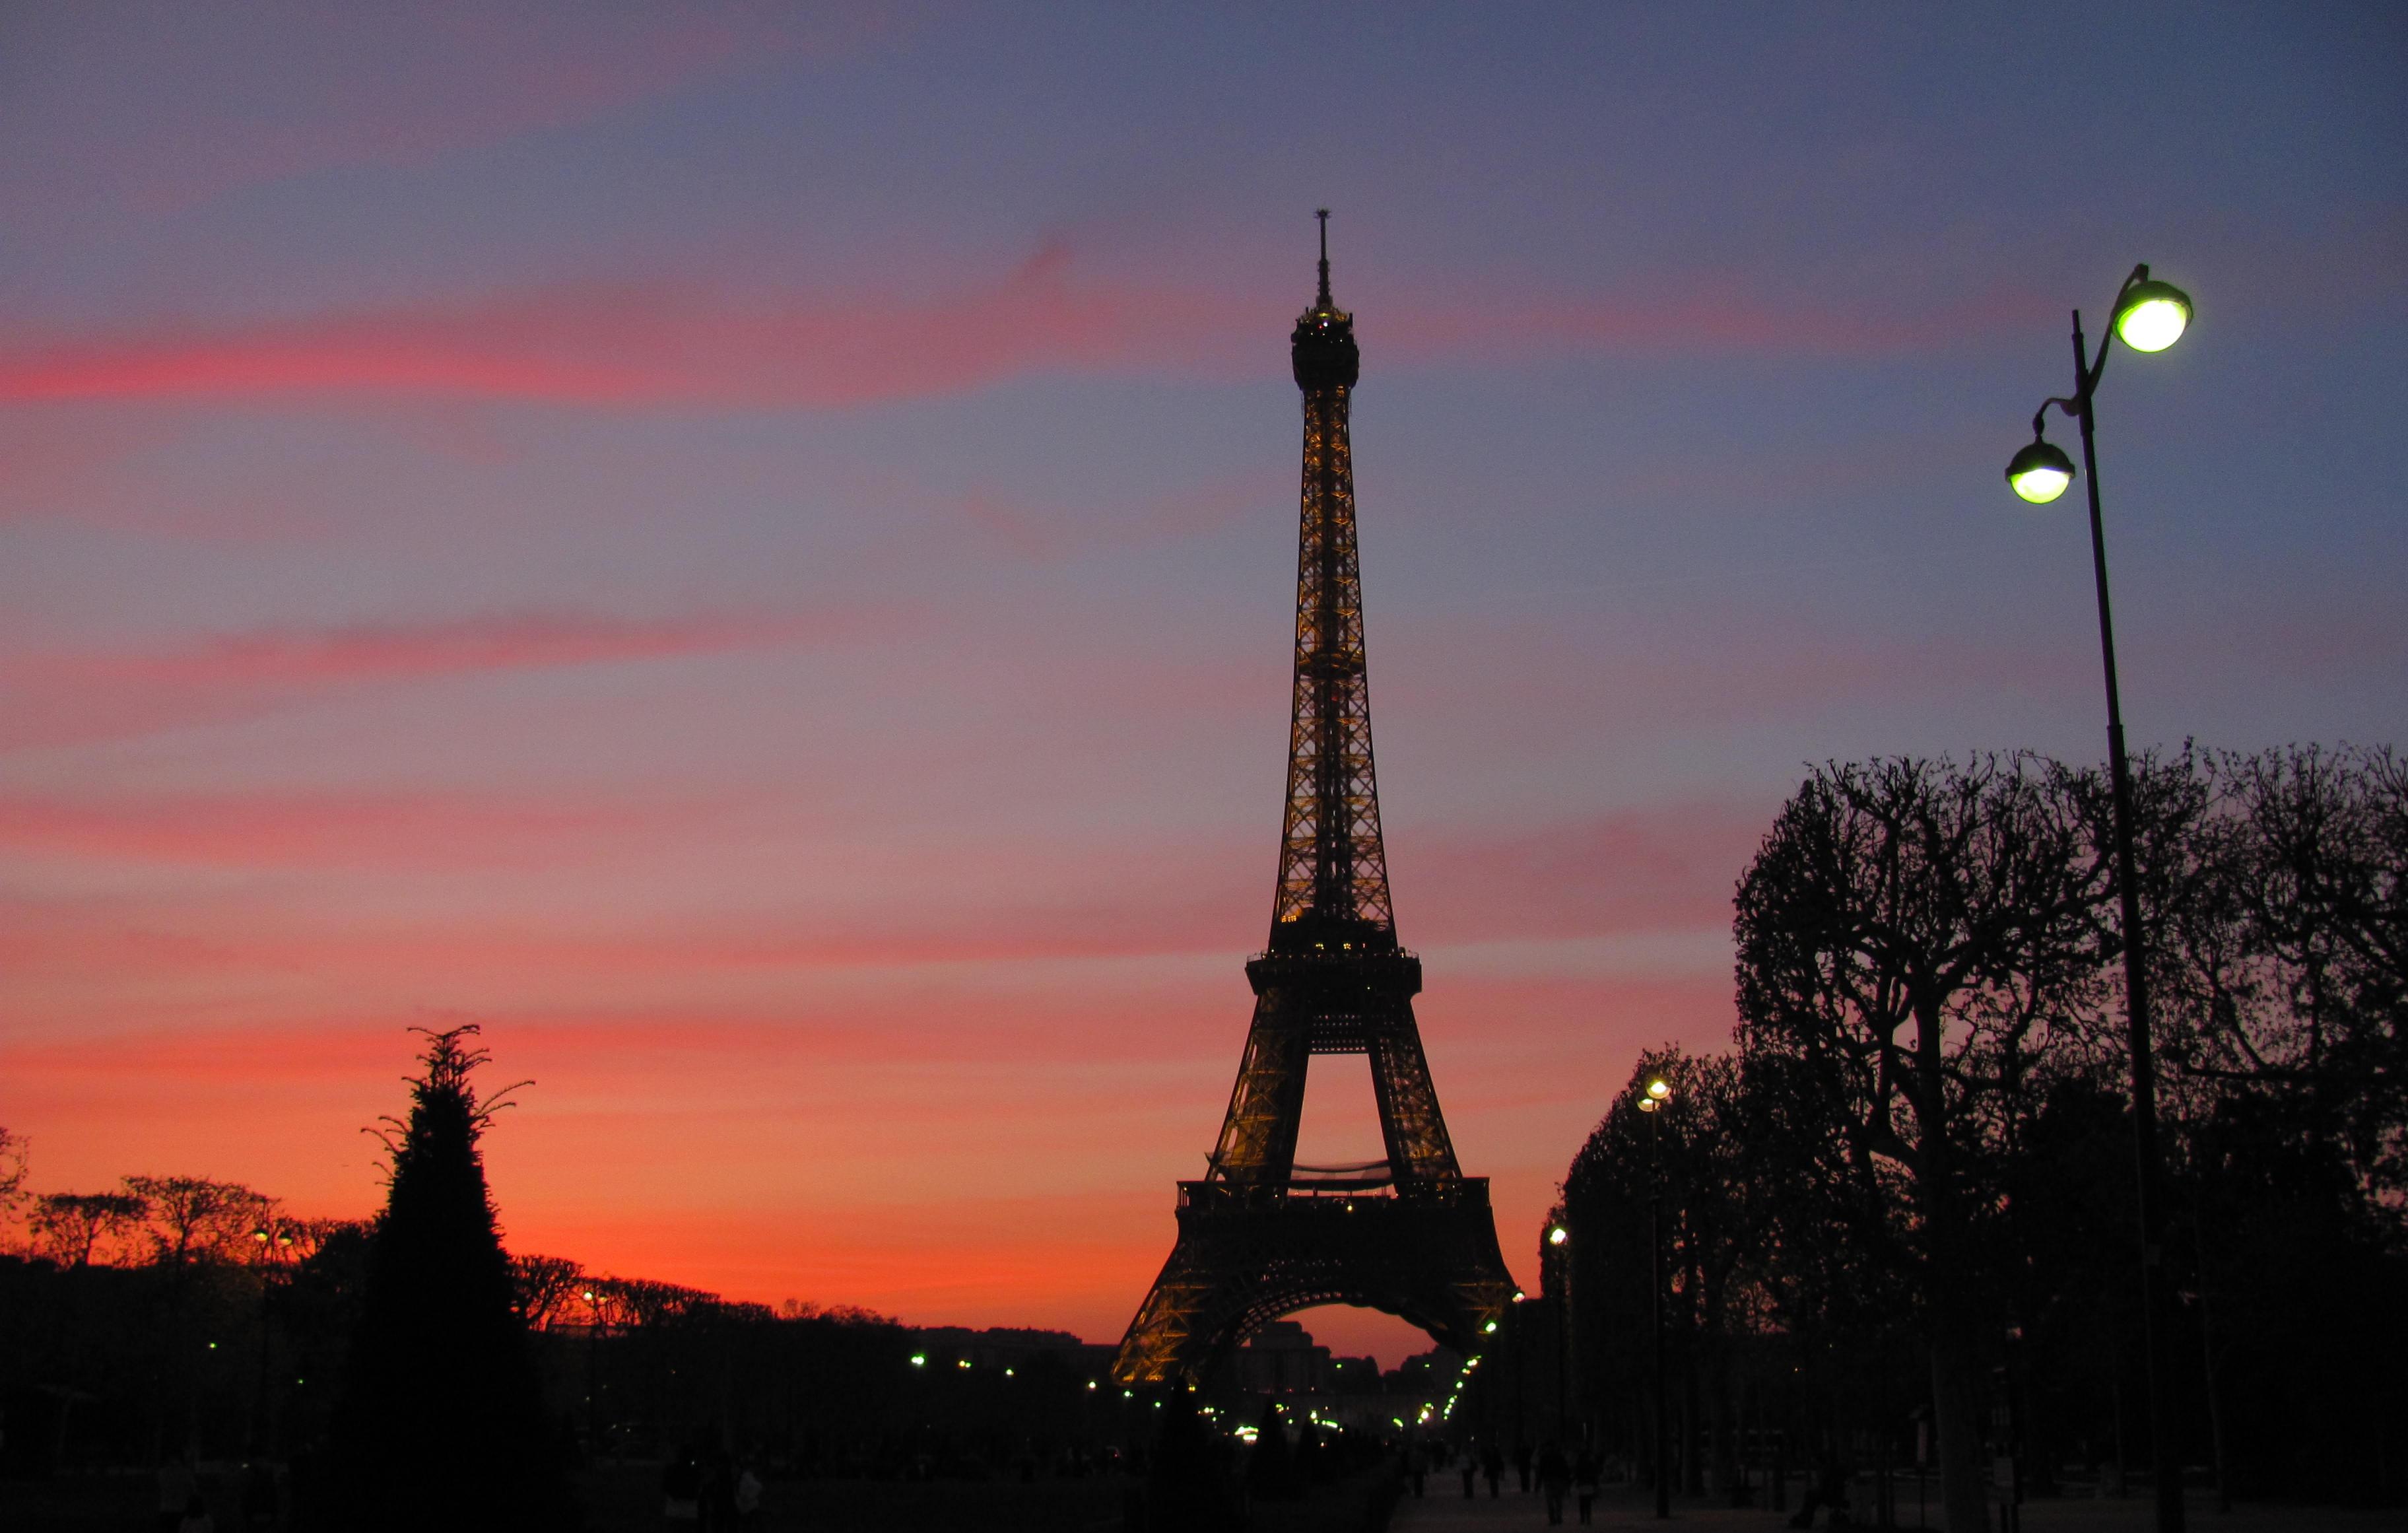 Paris Eiffel Tower Sunset By Fabiuswong On Deviantart